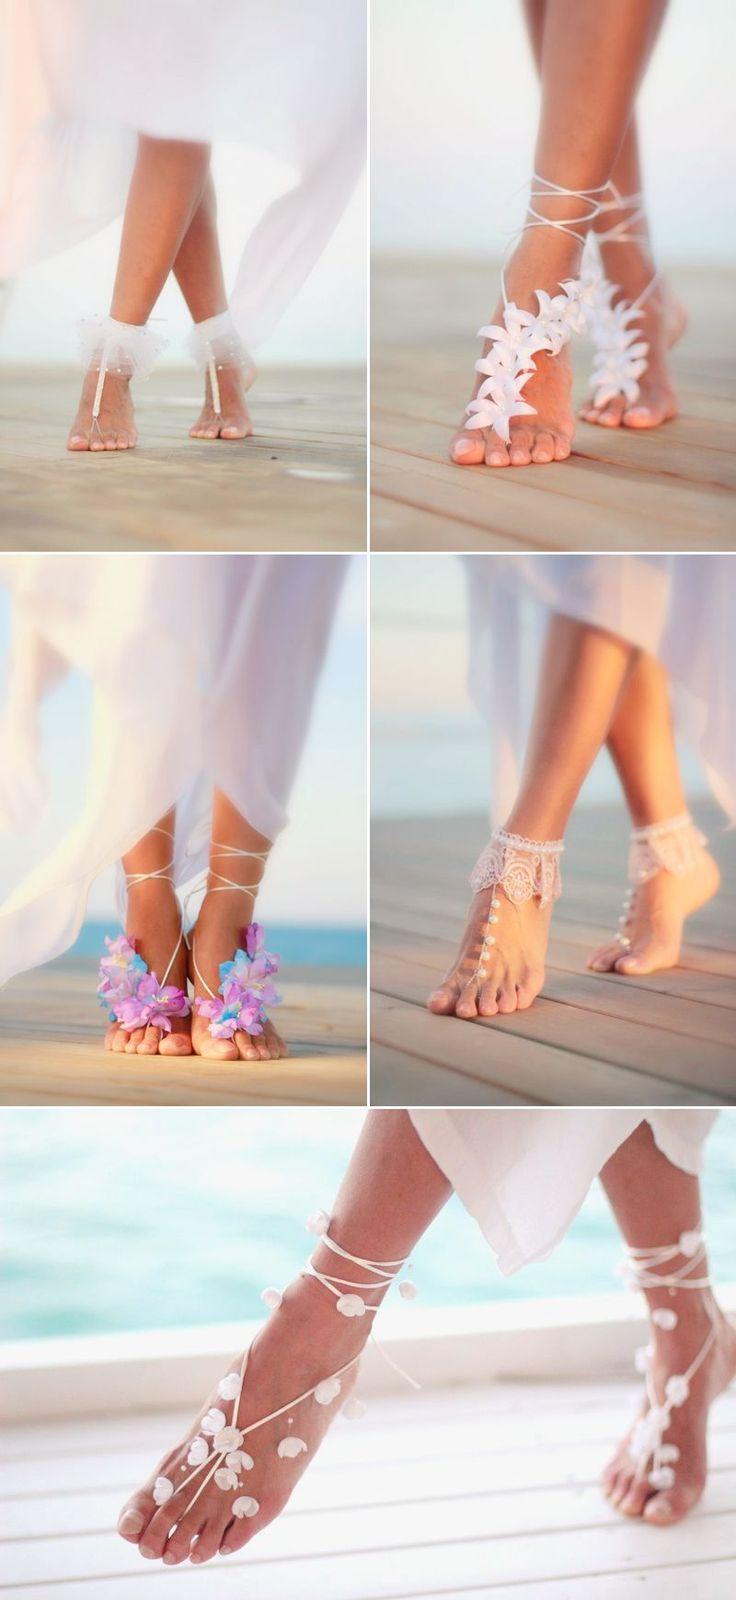 Best dresses to wear to a beach wedding   best Weddingus images on Pinterest